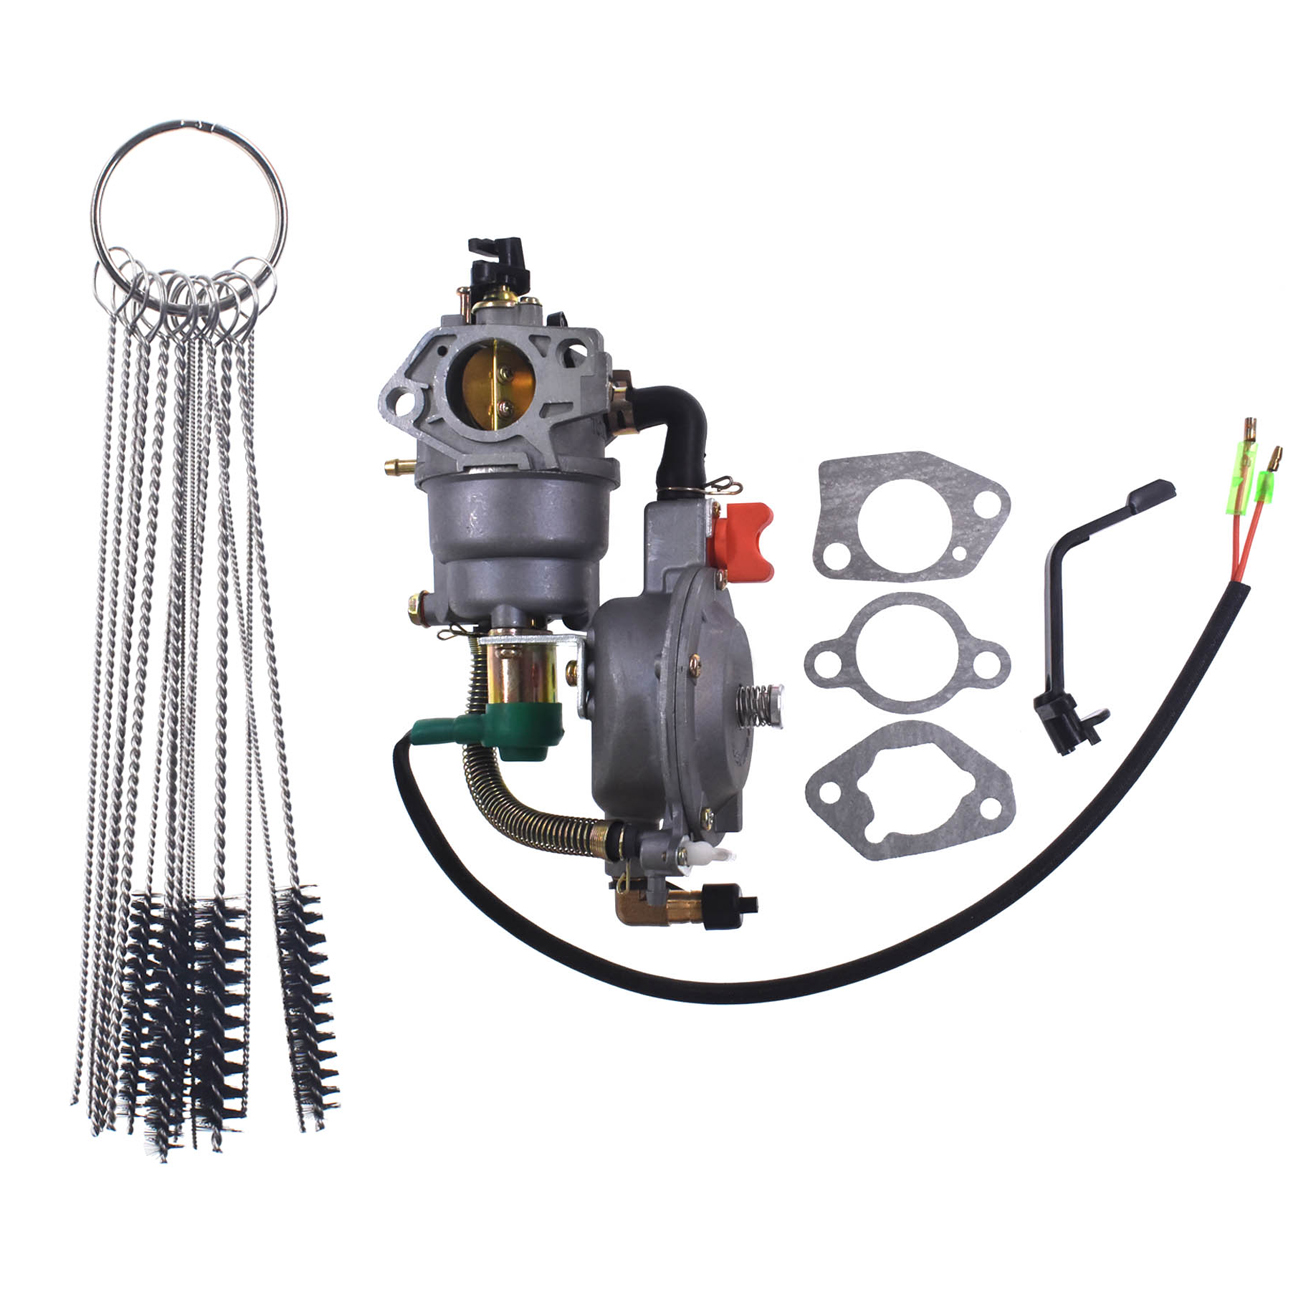 Carburetor Dual Fuel Cleaning Brush Propane/Gasoline Fit Honda GX340/GX390Carburetor Dual Fuel Cleaning Brush Propane/Gasoline Fit Honda GX340/GX390